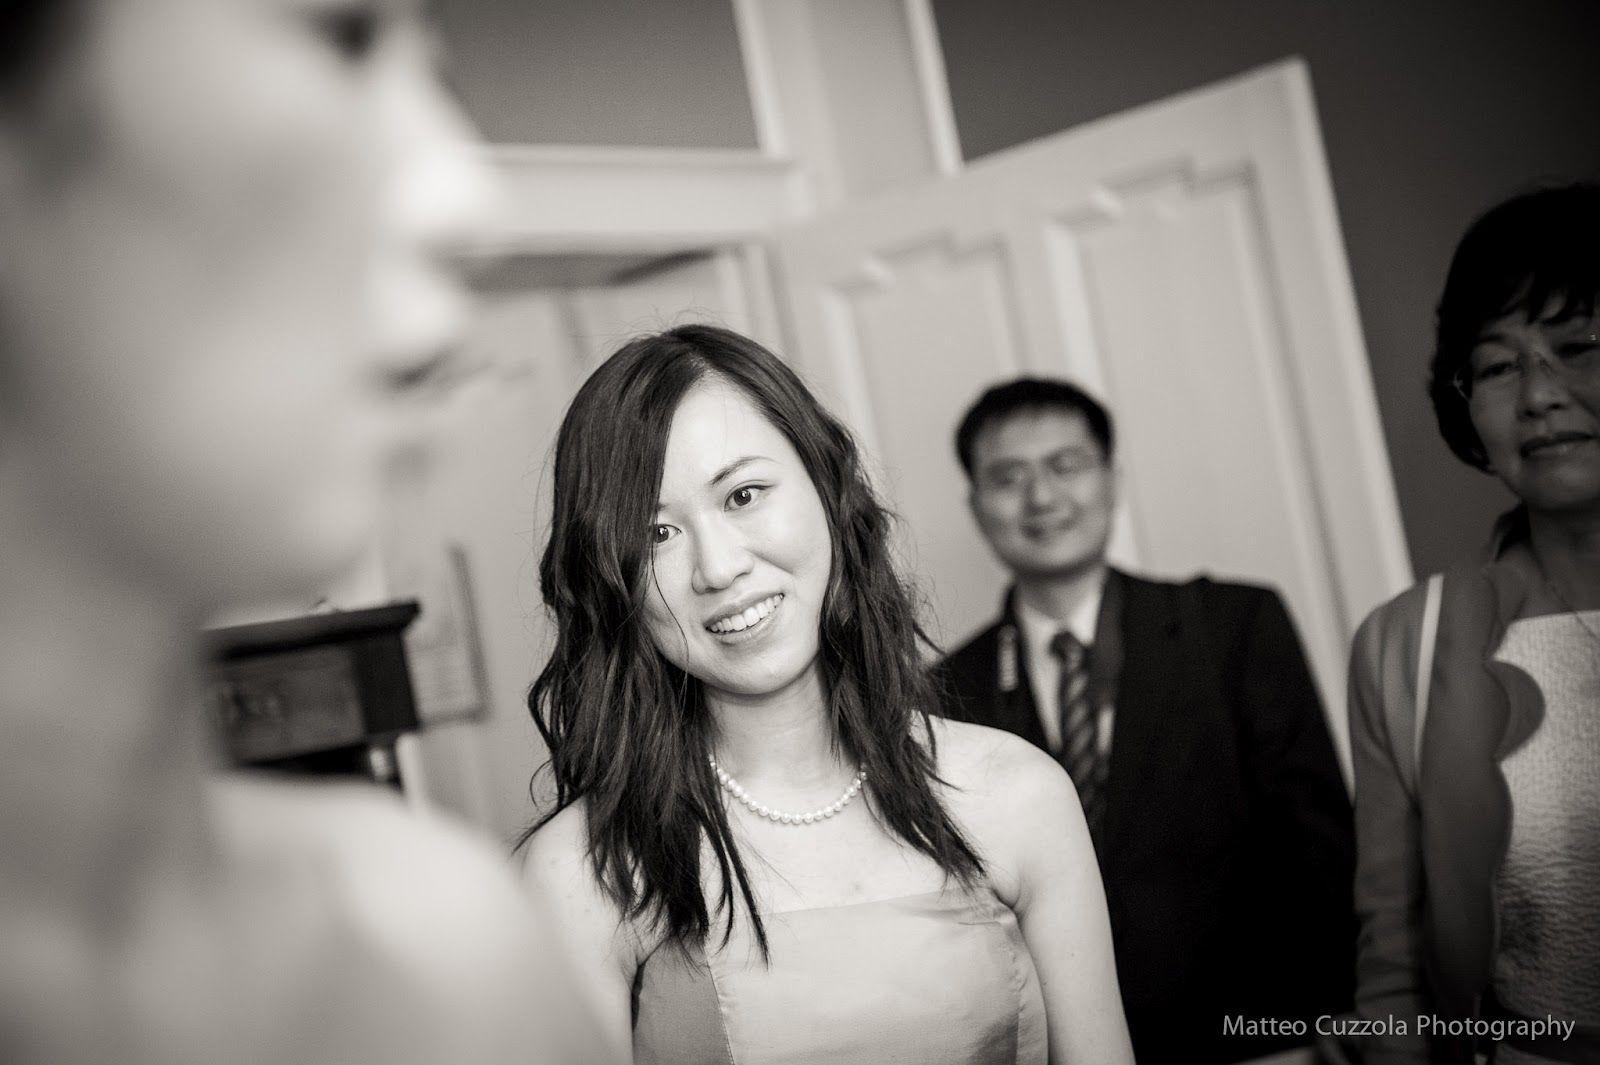 Matteo Cuzzola Photography: Matrimonio a Villa D'Este, Cernobbio - Vicky e Massimo 23 Giugno 2012